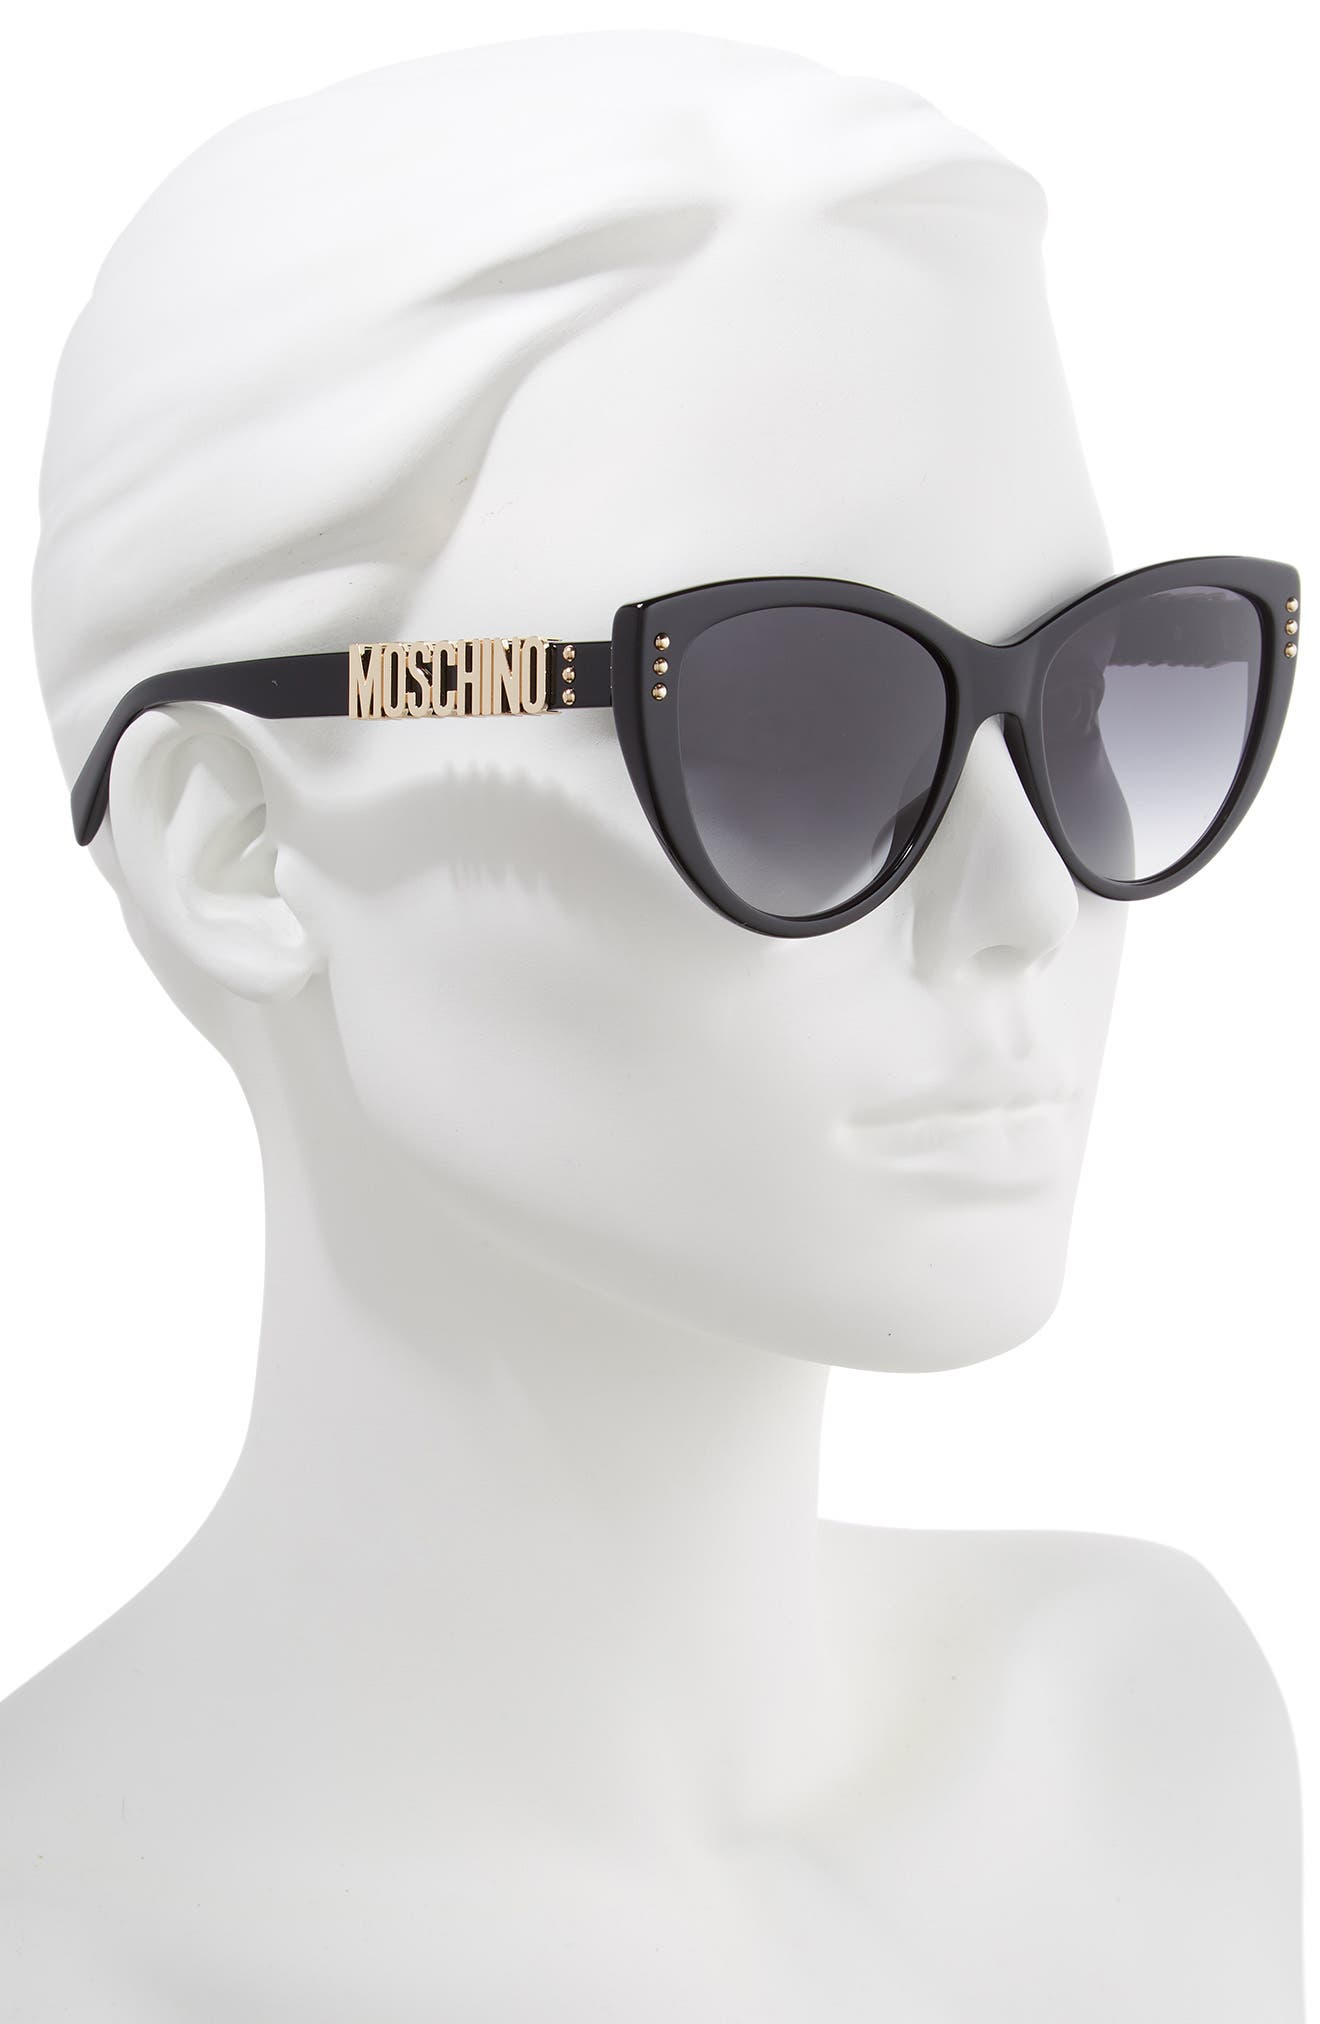 56mm Gradient Cat Eye Sunglasses,                             Alternate thumbnail 2, color,                             BLACK